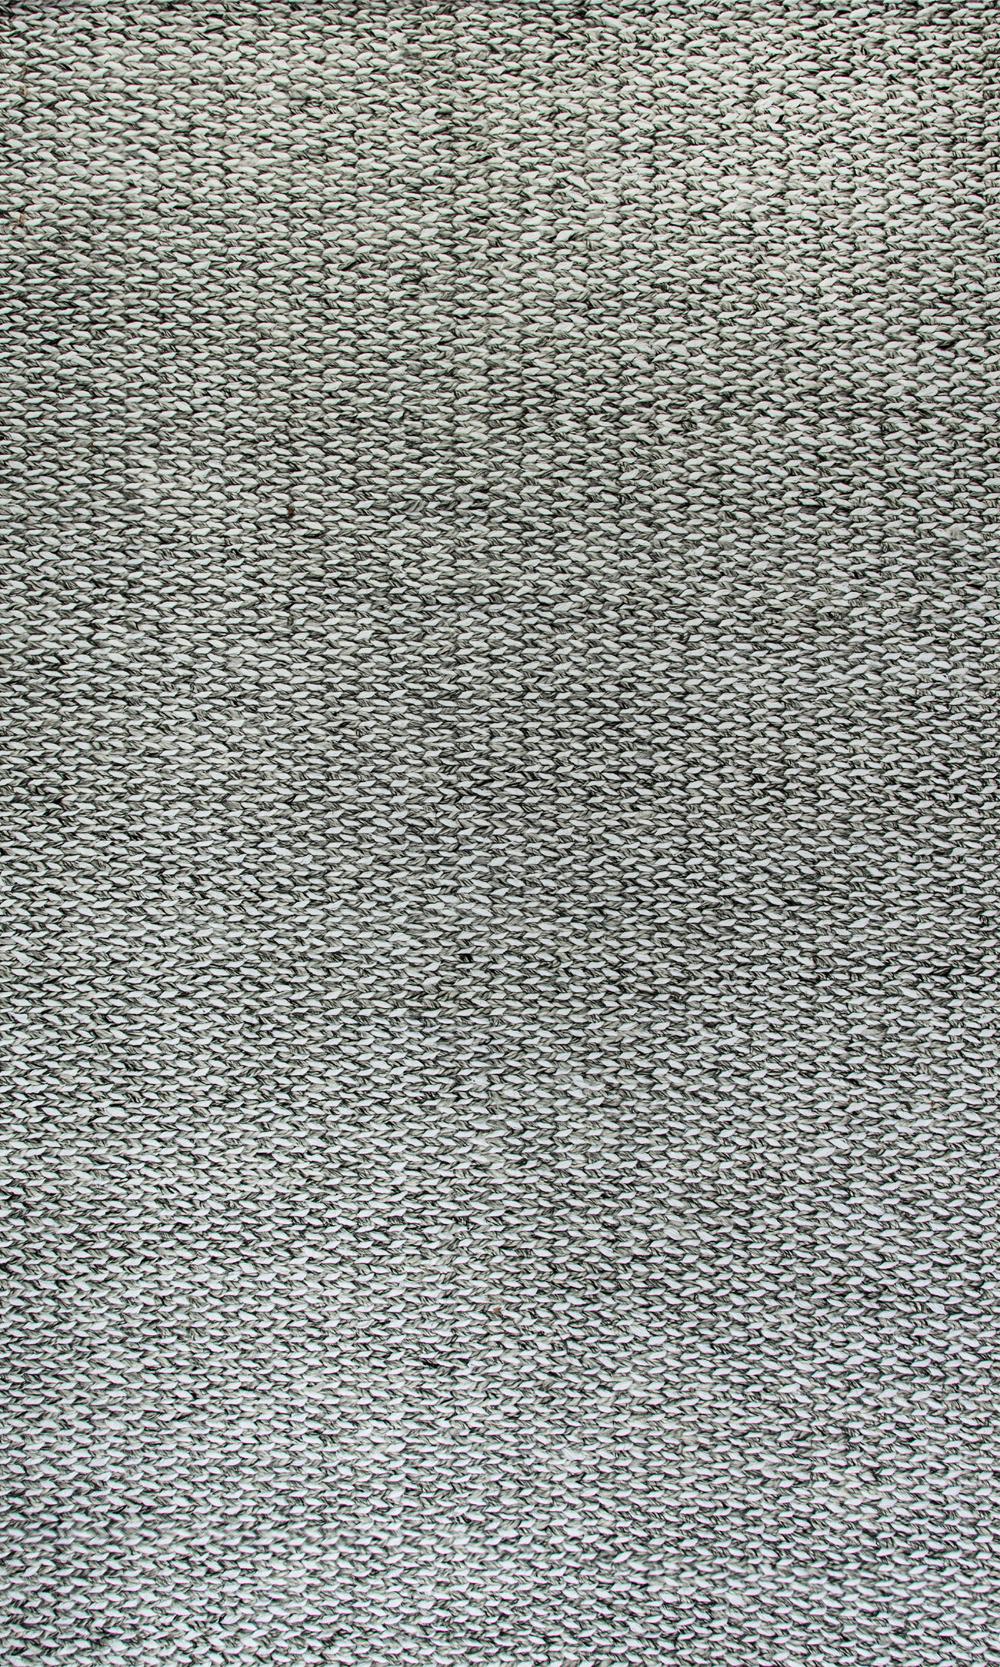 Dynamic ZEST 40805 GREY/IVORY Rug